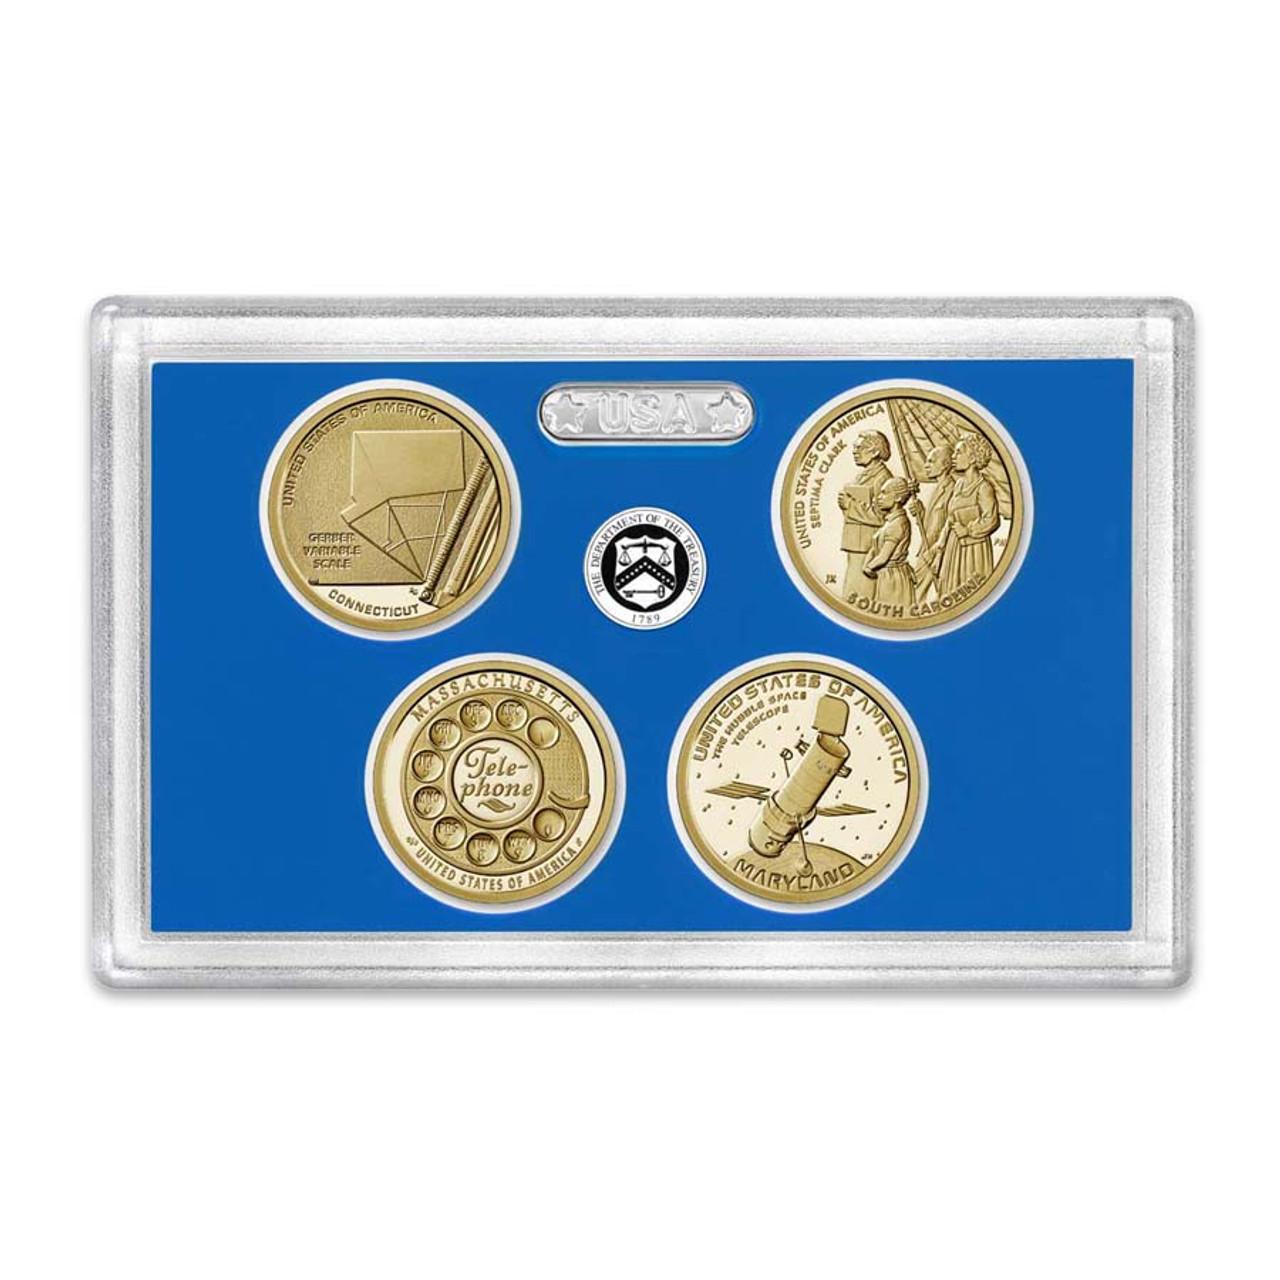 2020 Innovation Dollar Proof Set 4 Coins